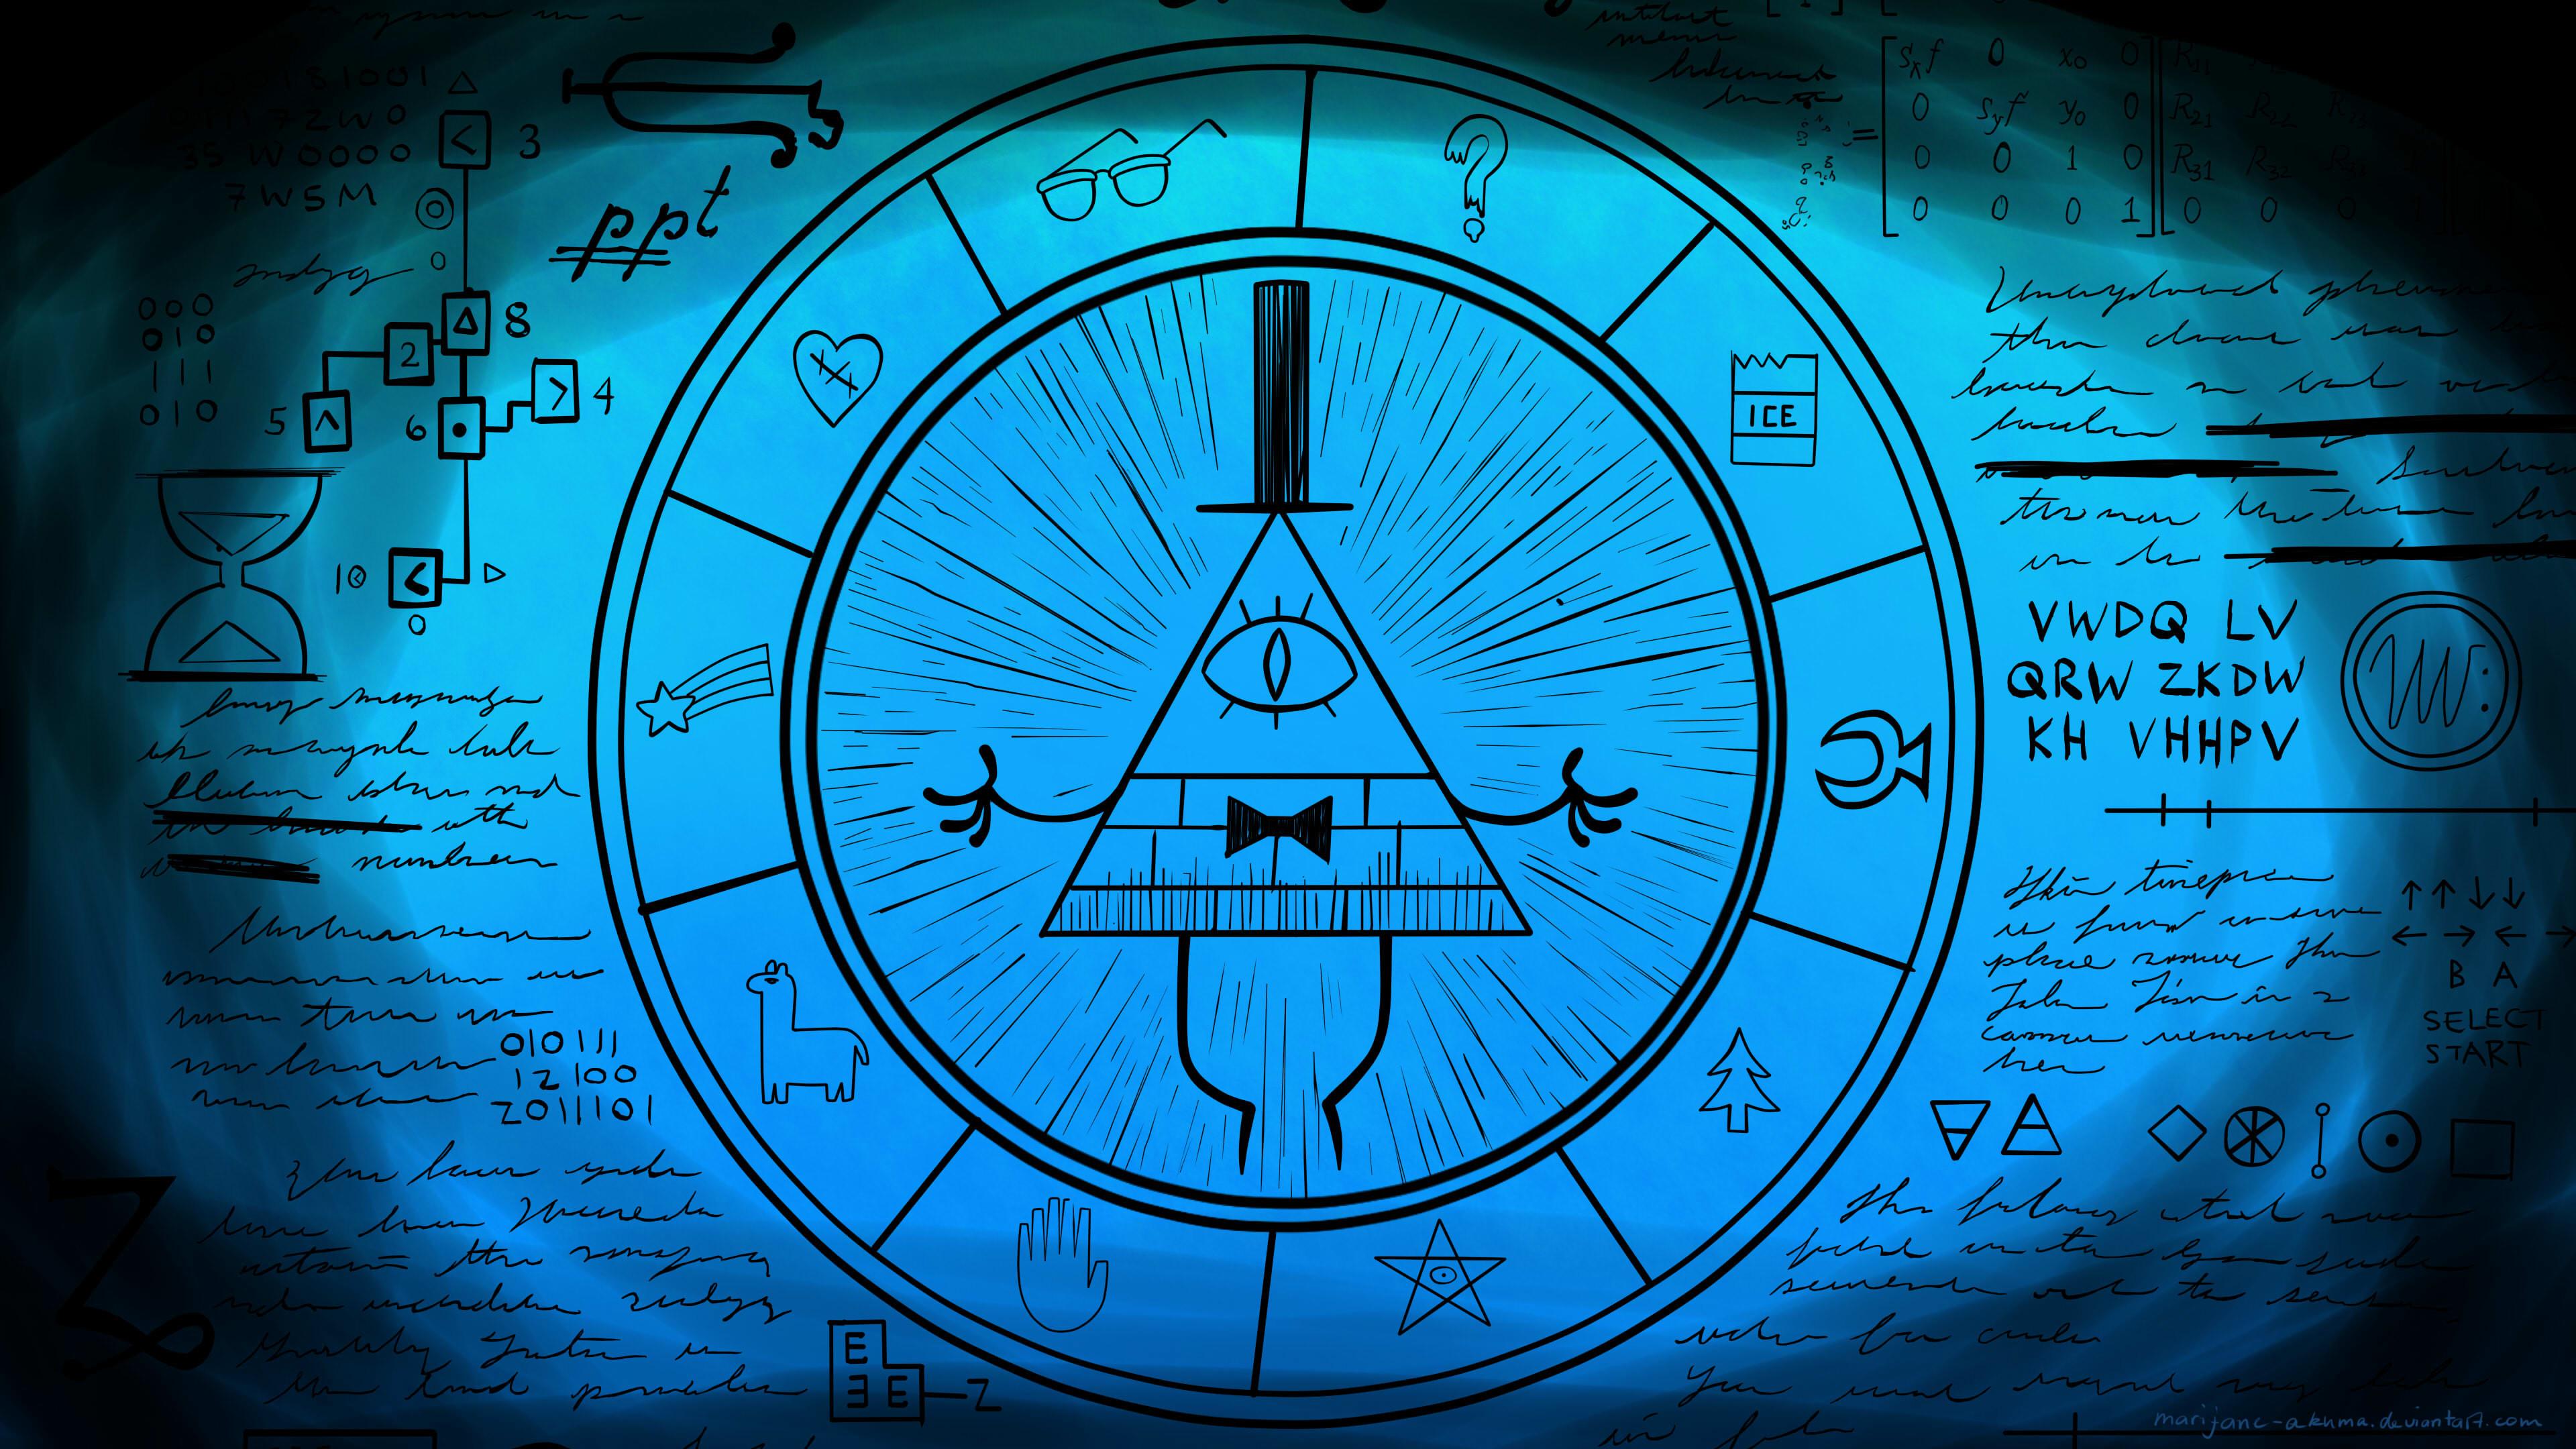 Res: 3840x2160, ... Bill Cipher Wheel Part 5 by Marijane-Akuma